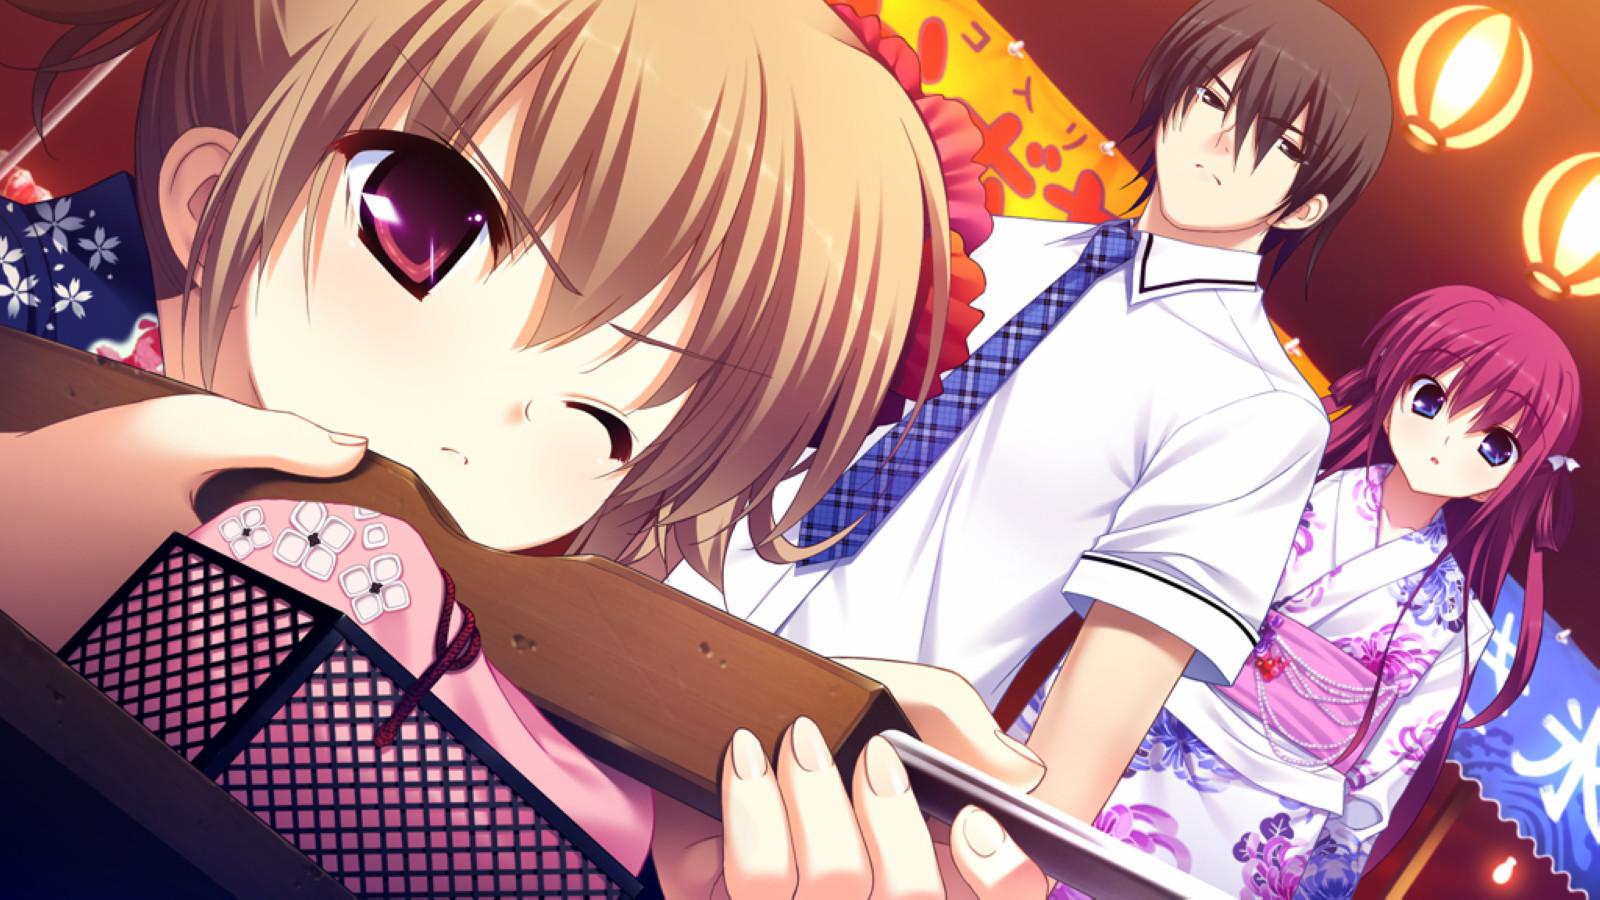 Grisaia no Kajitsu / 2014 / Anime / Mp4 / TR Altyazılı